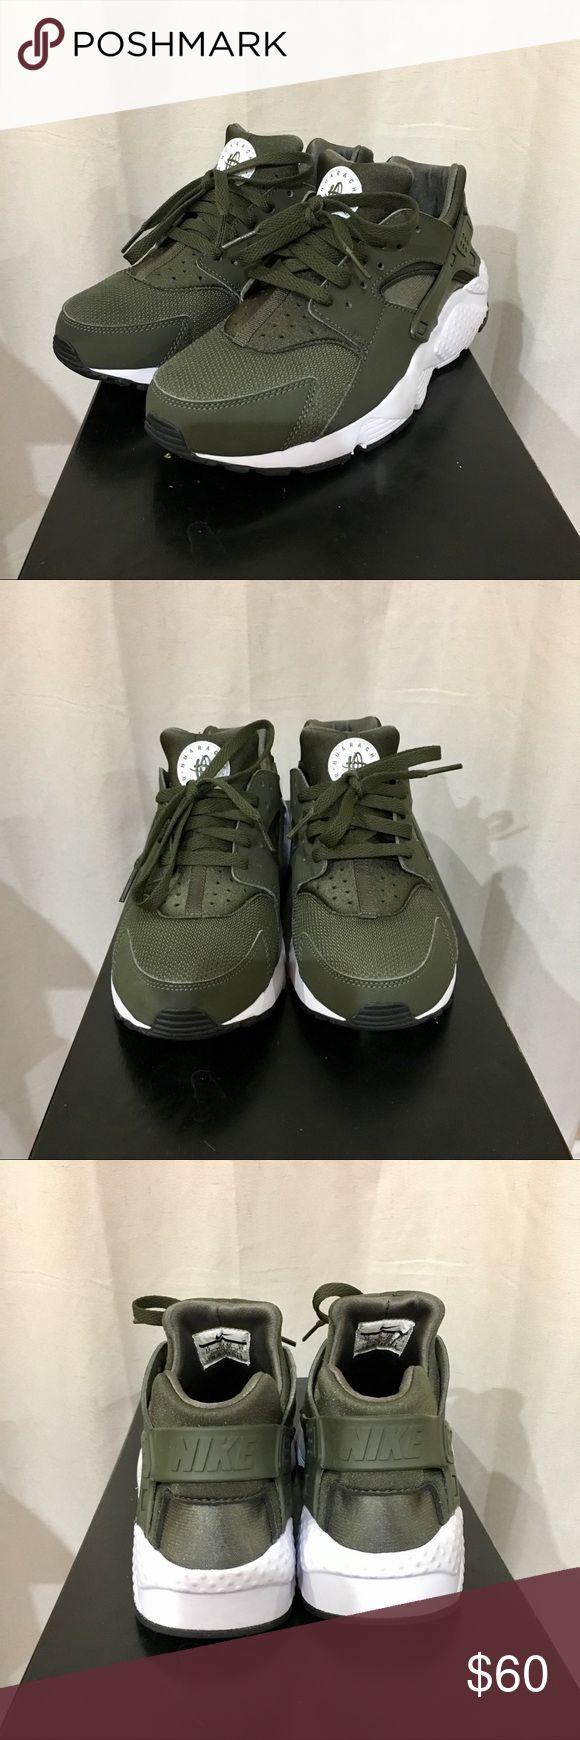 Nike Huarache Olive Green - Size 7Y (Women's 8.5)